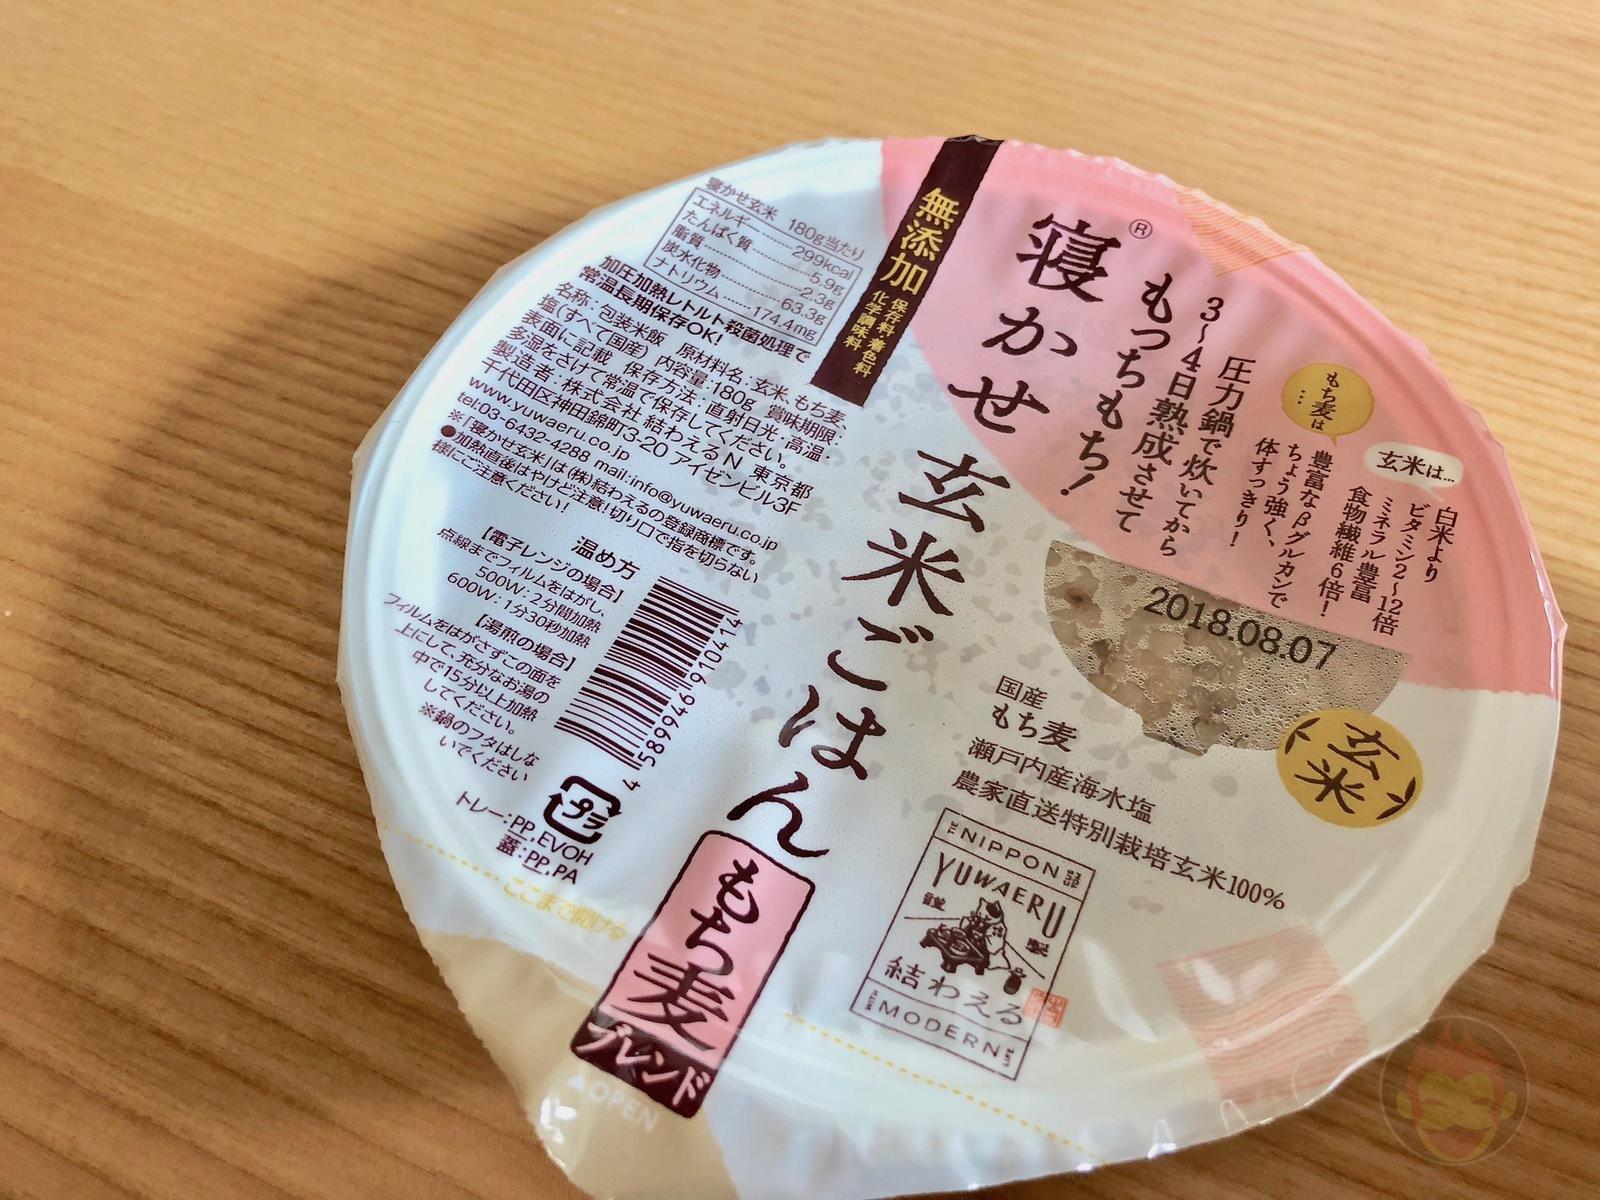 Nekase Genmai Yuwaeru Package 01